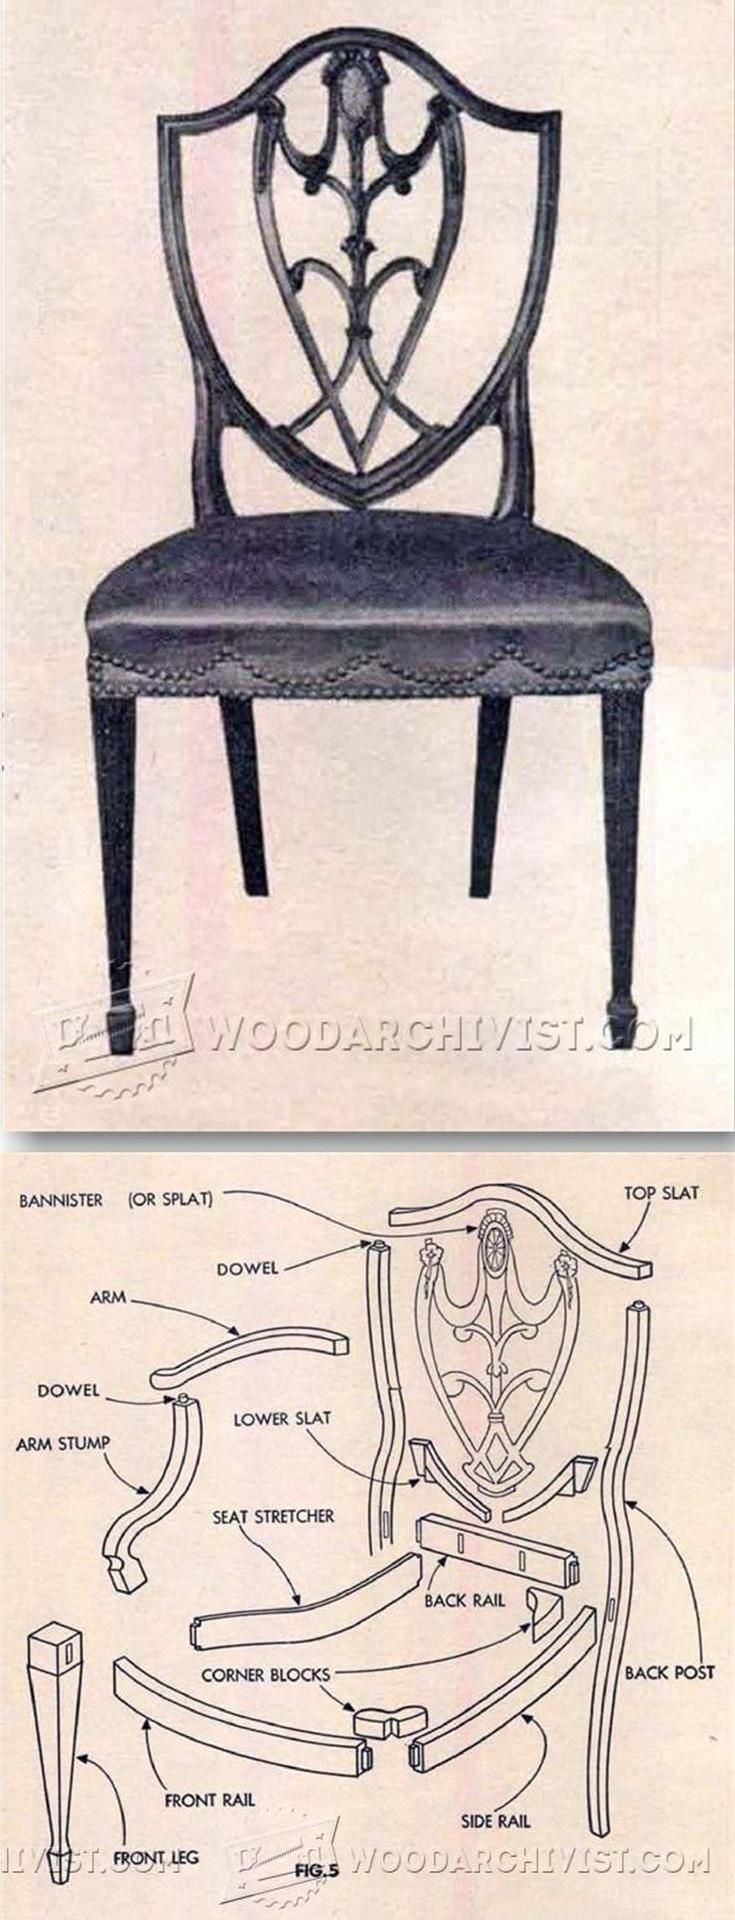 56 best hepplewhite furniture images on pinterest antique